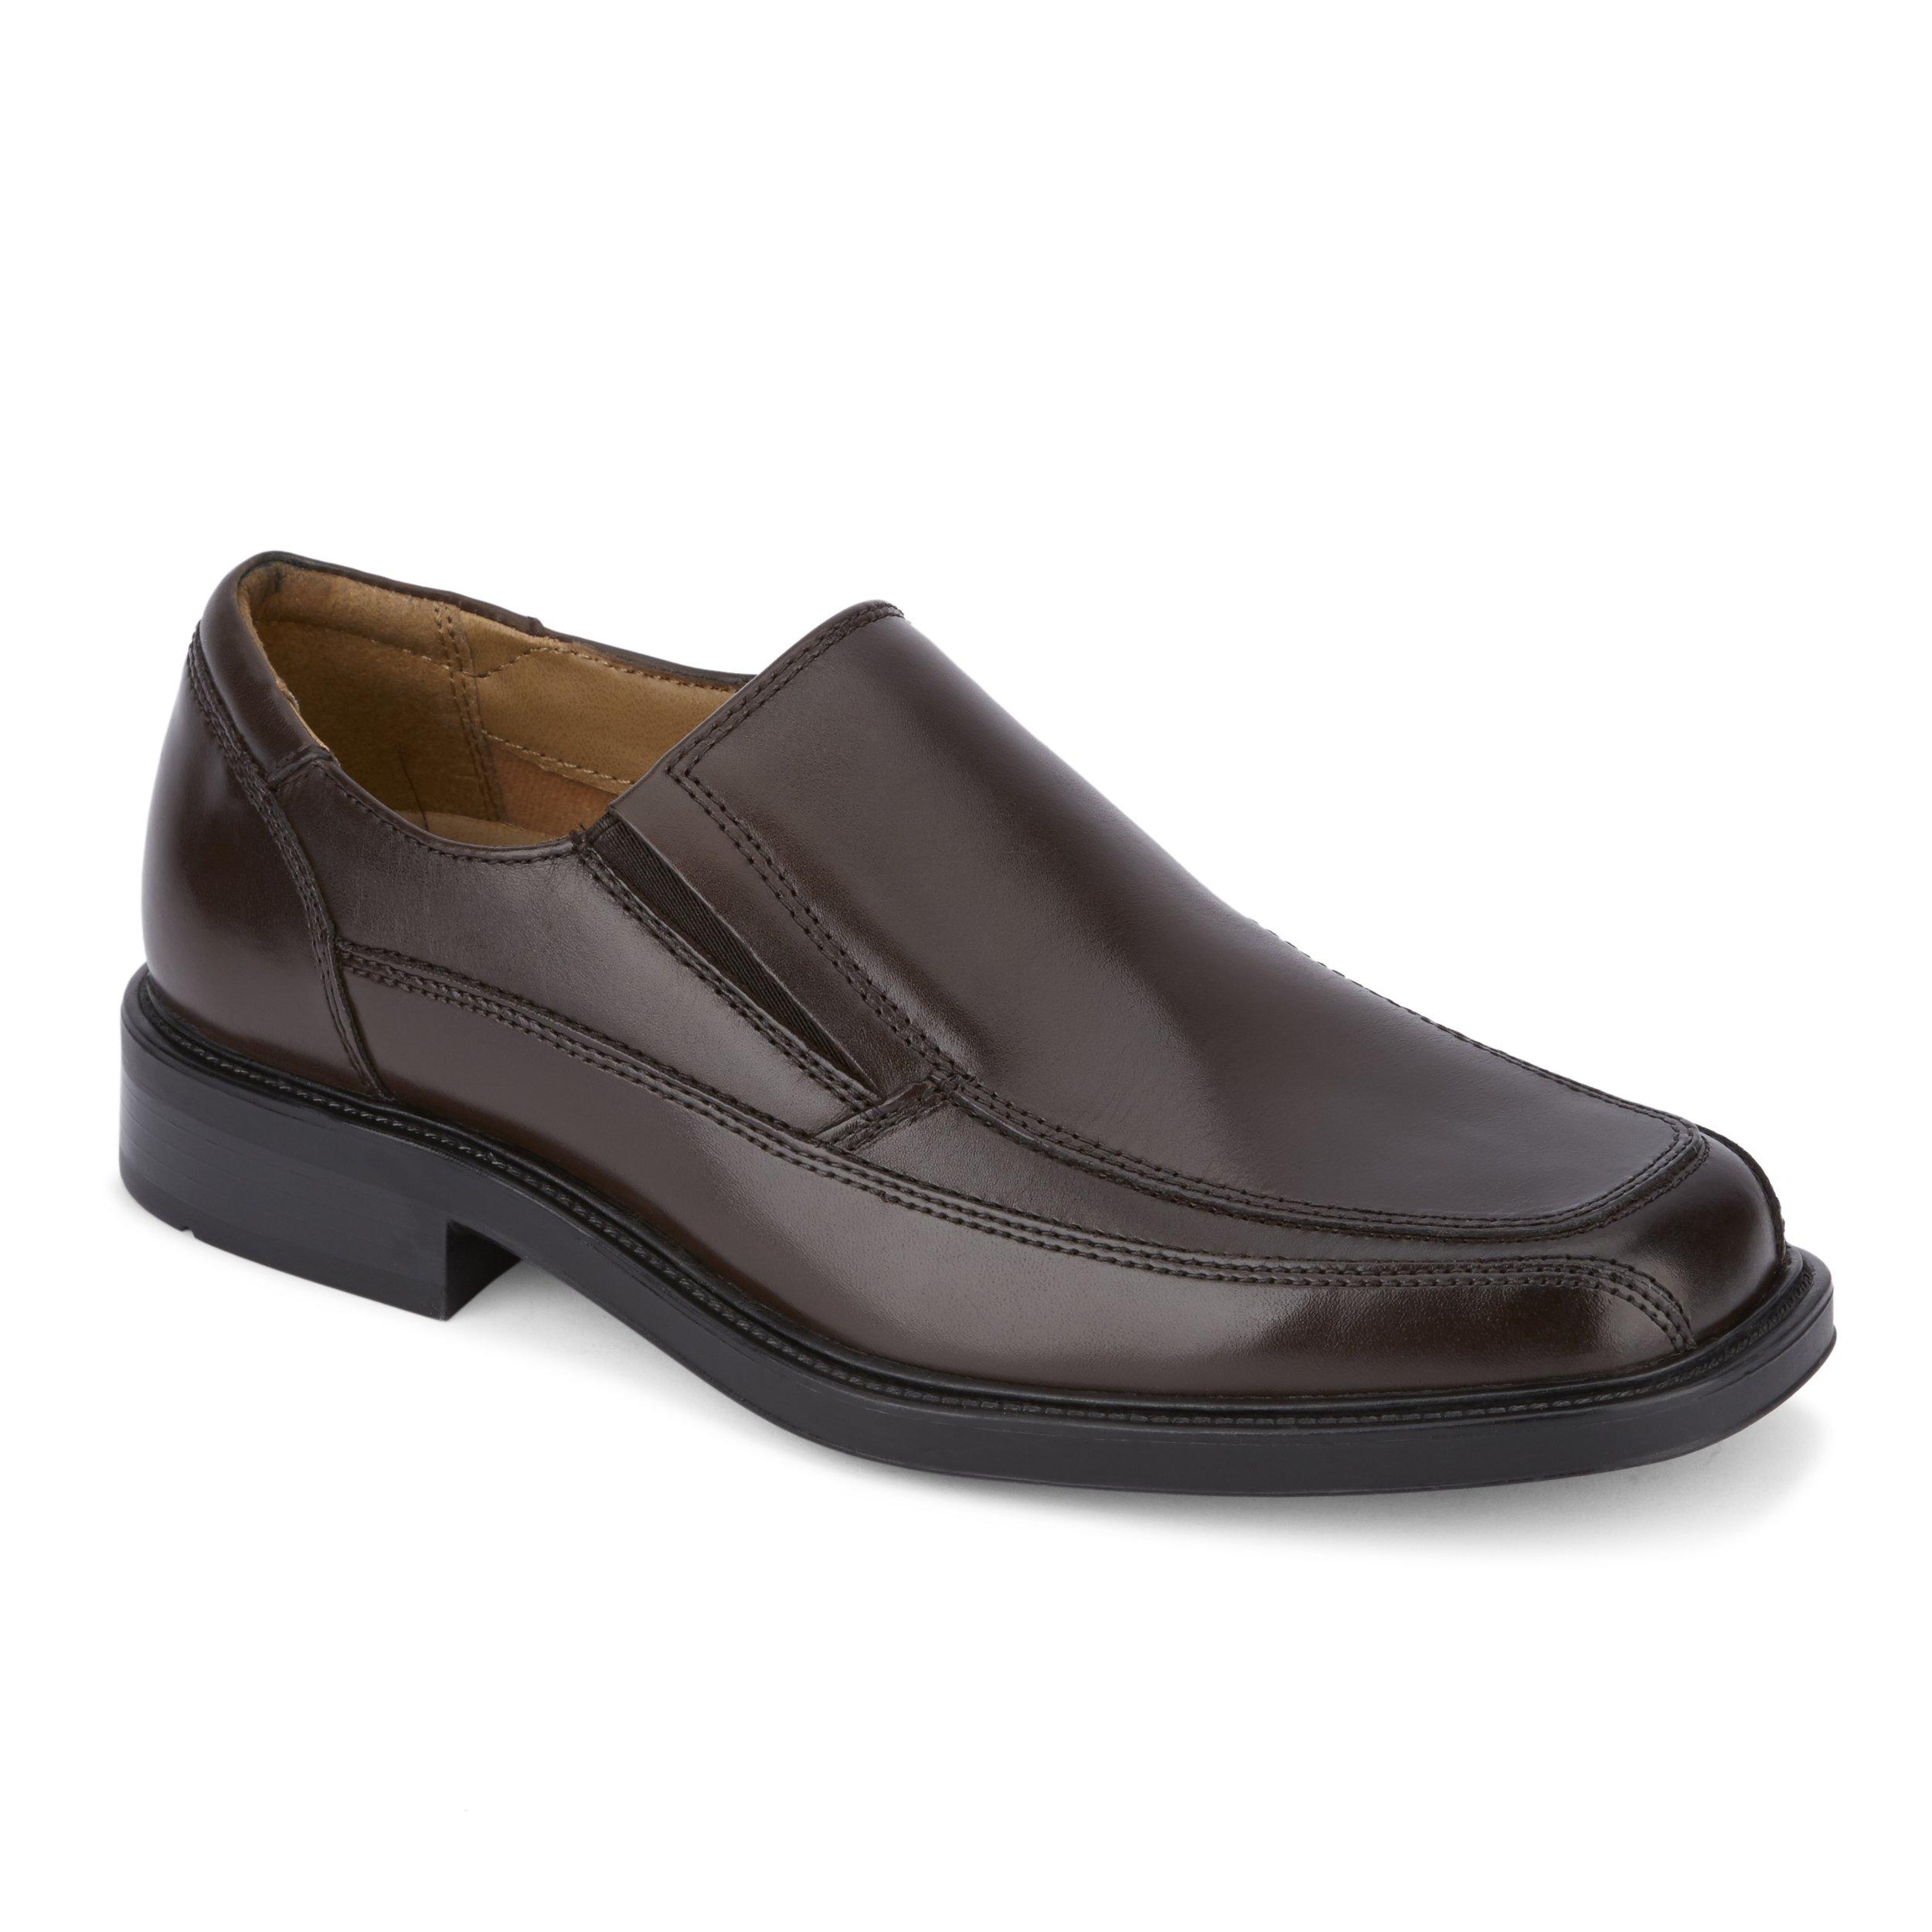 Dockers Mens Proposal Oxford Shoe by Dockers